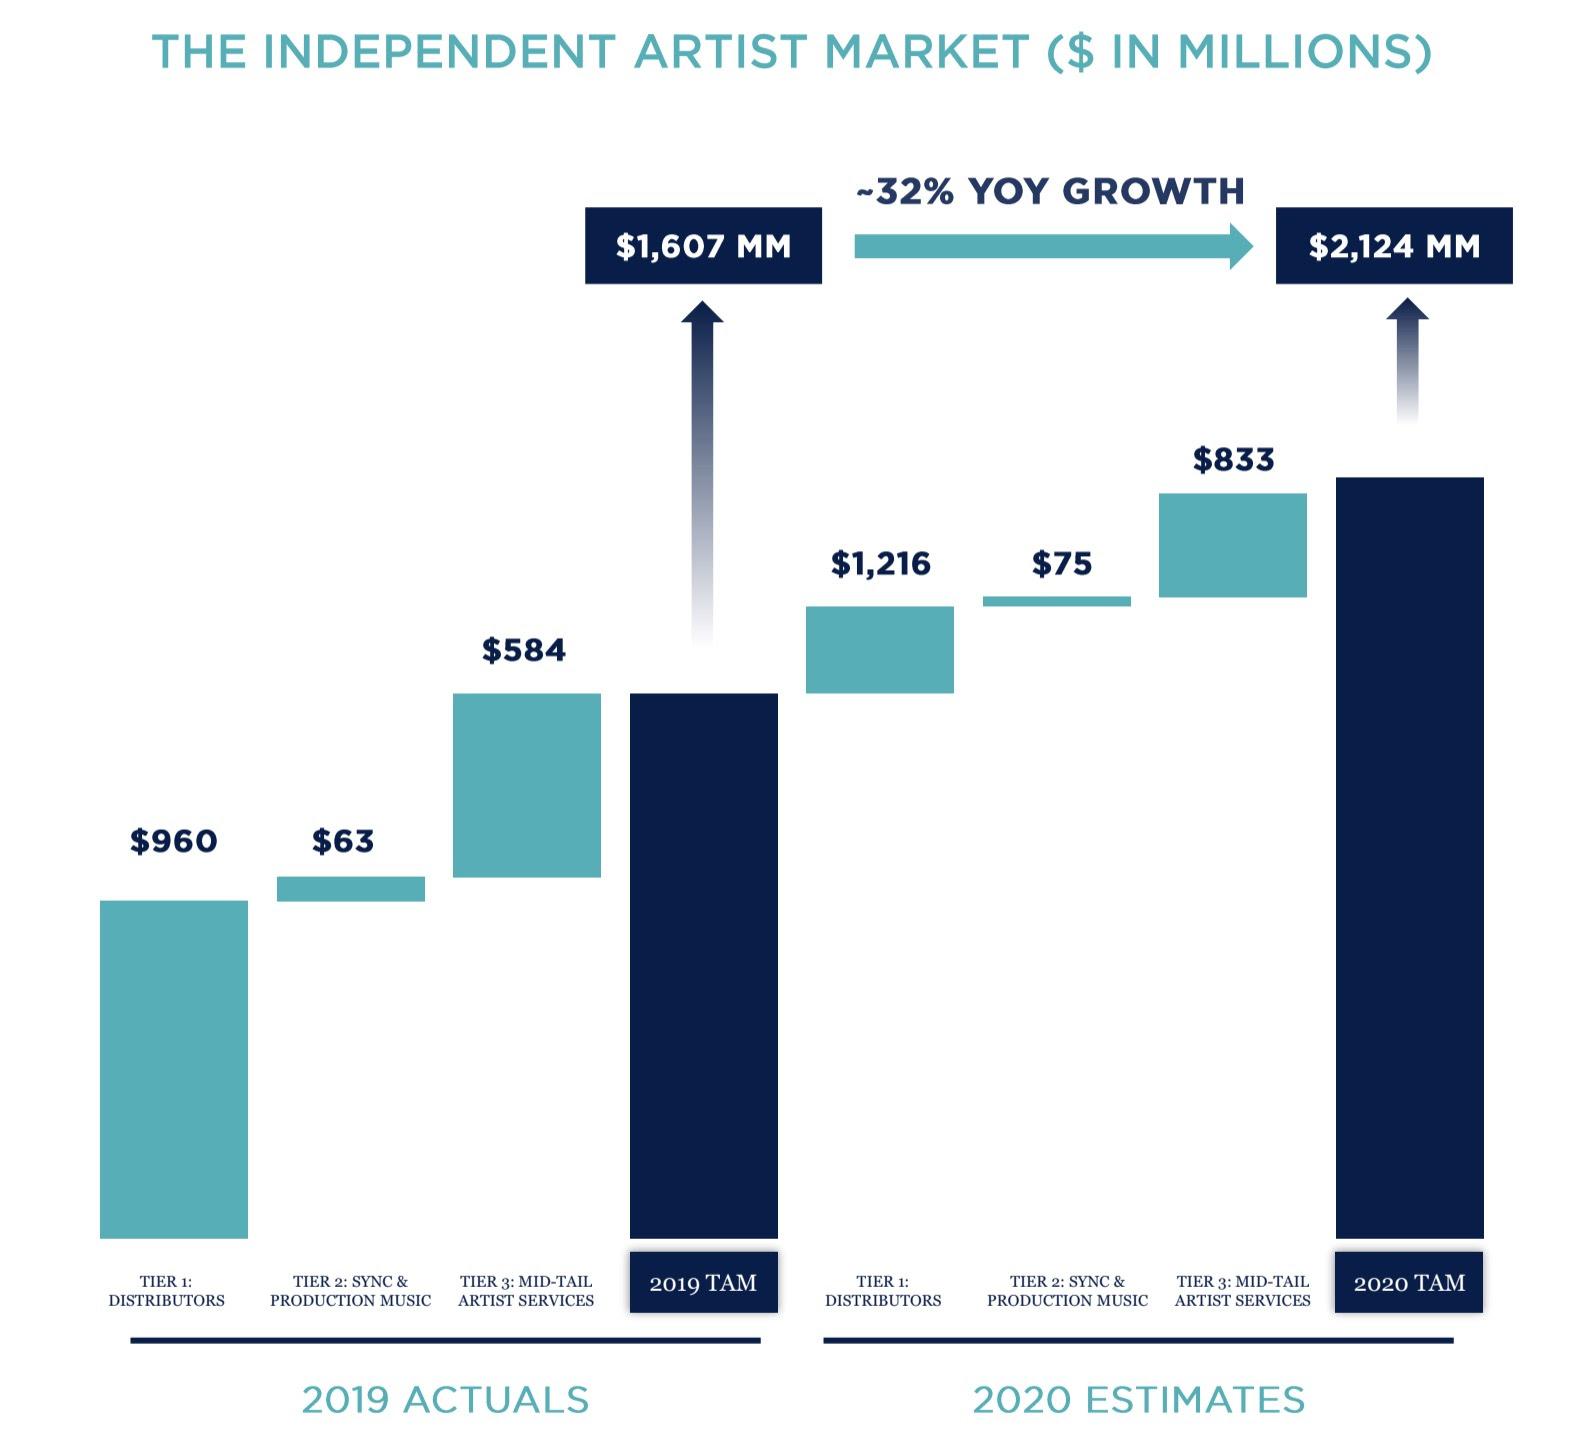 Graph of Independent Artist Market